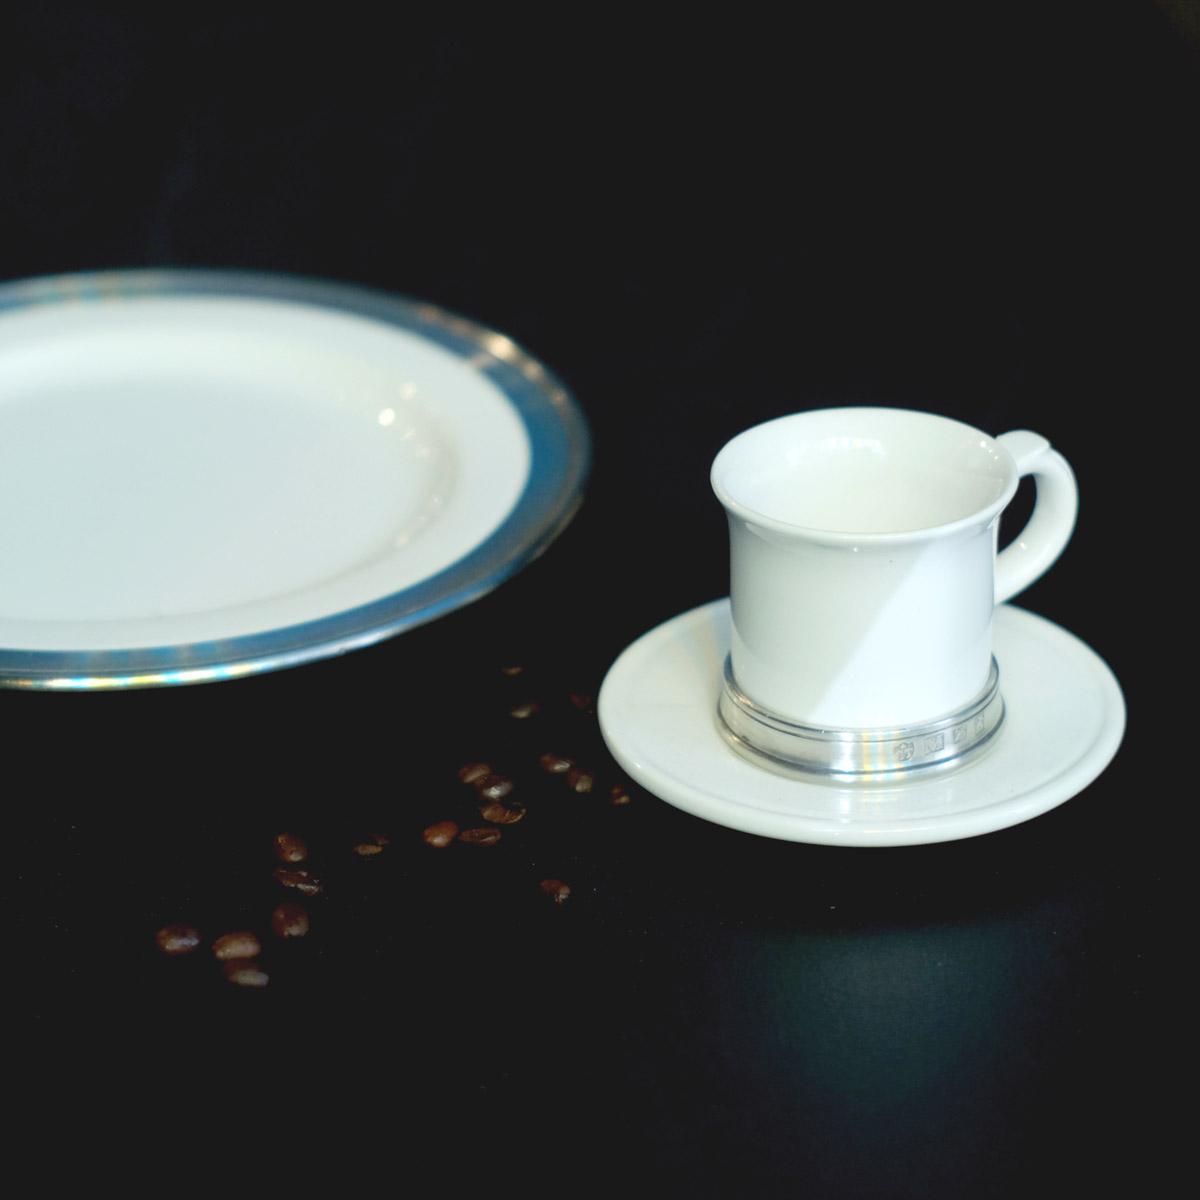 cosi-tabellini-espressotasse-geschirr-porzellan-tasse-coffee-2